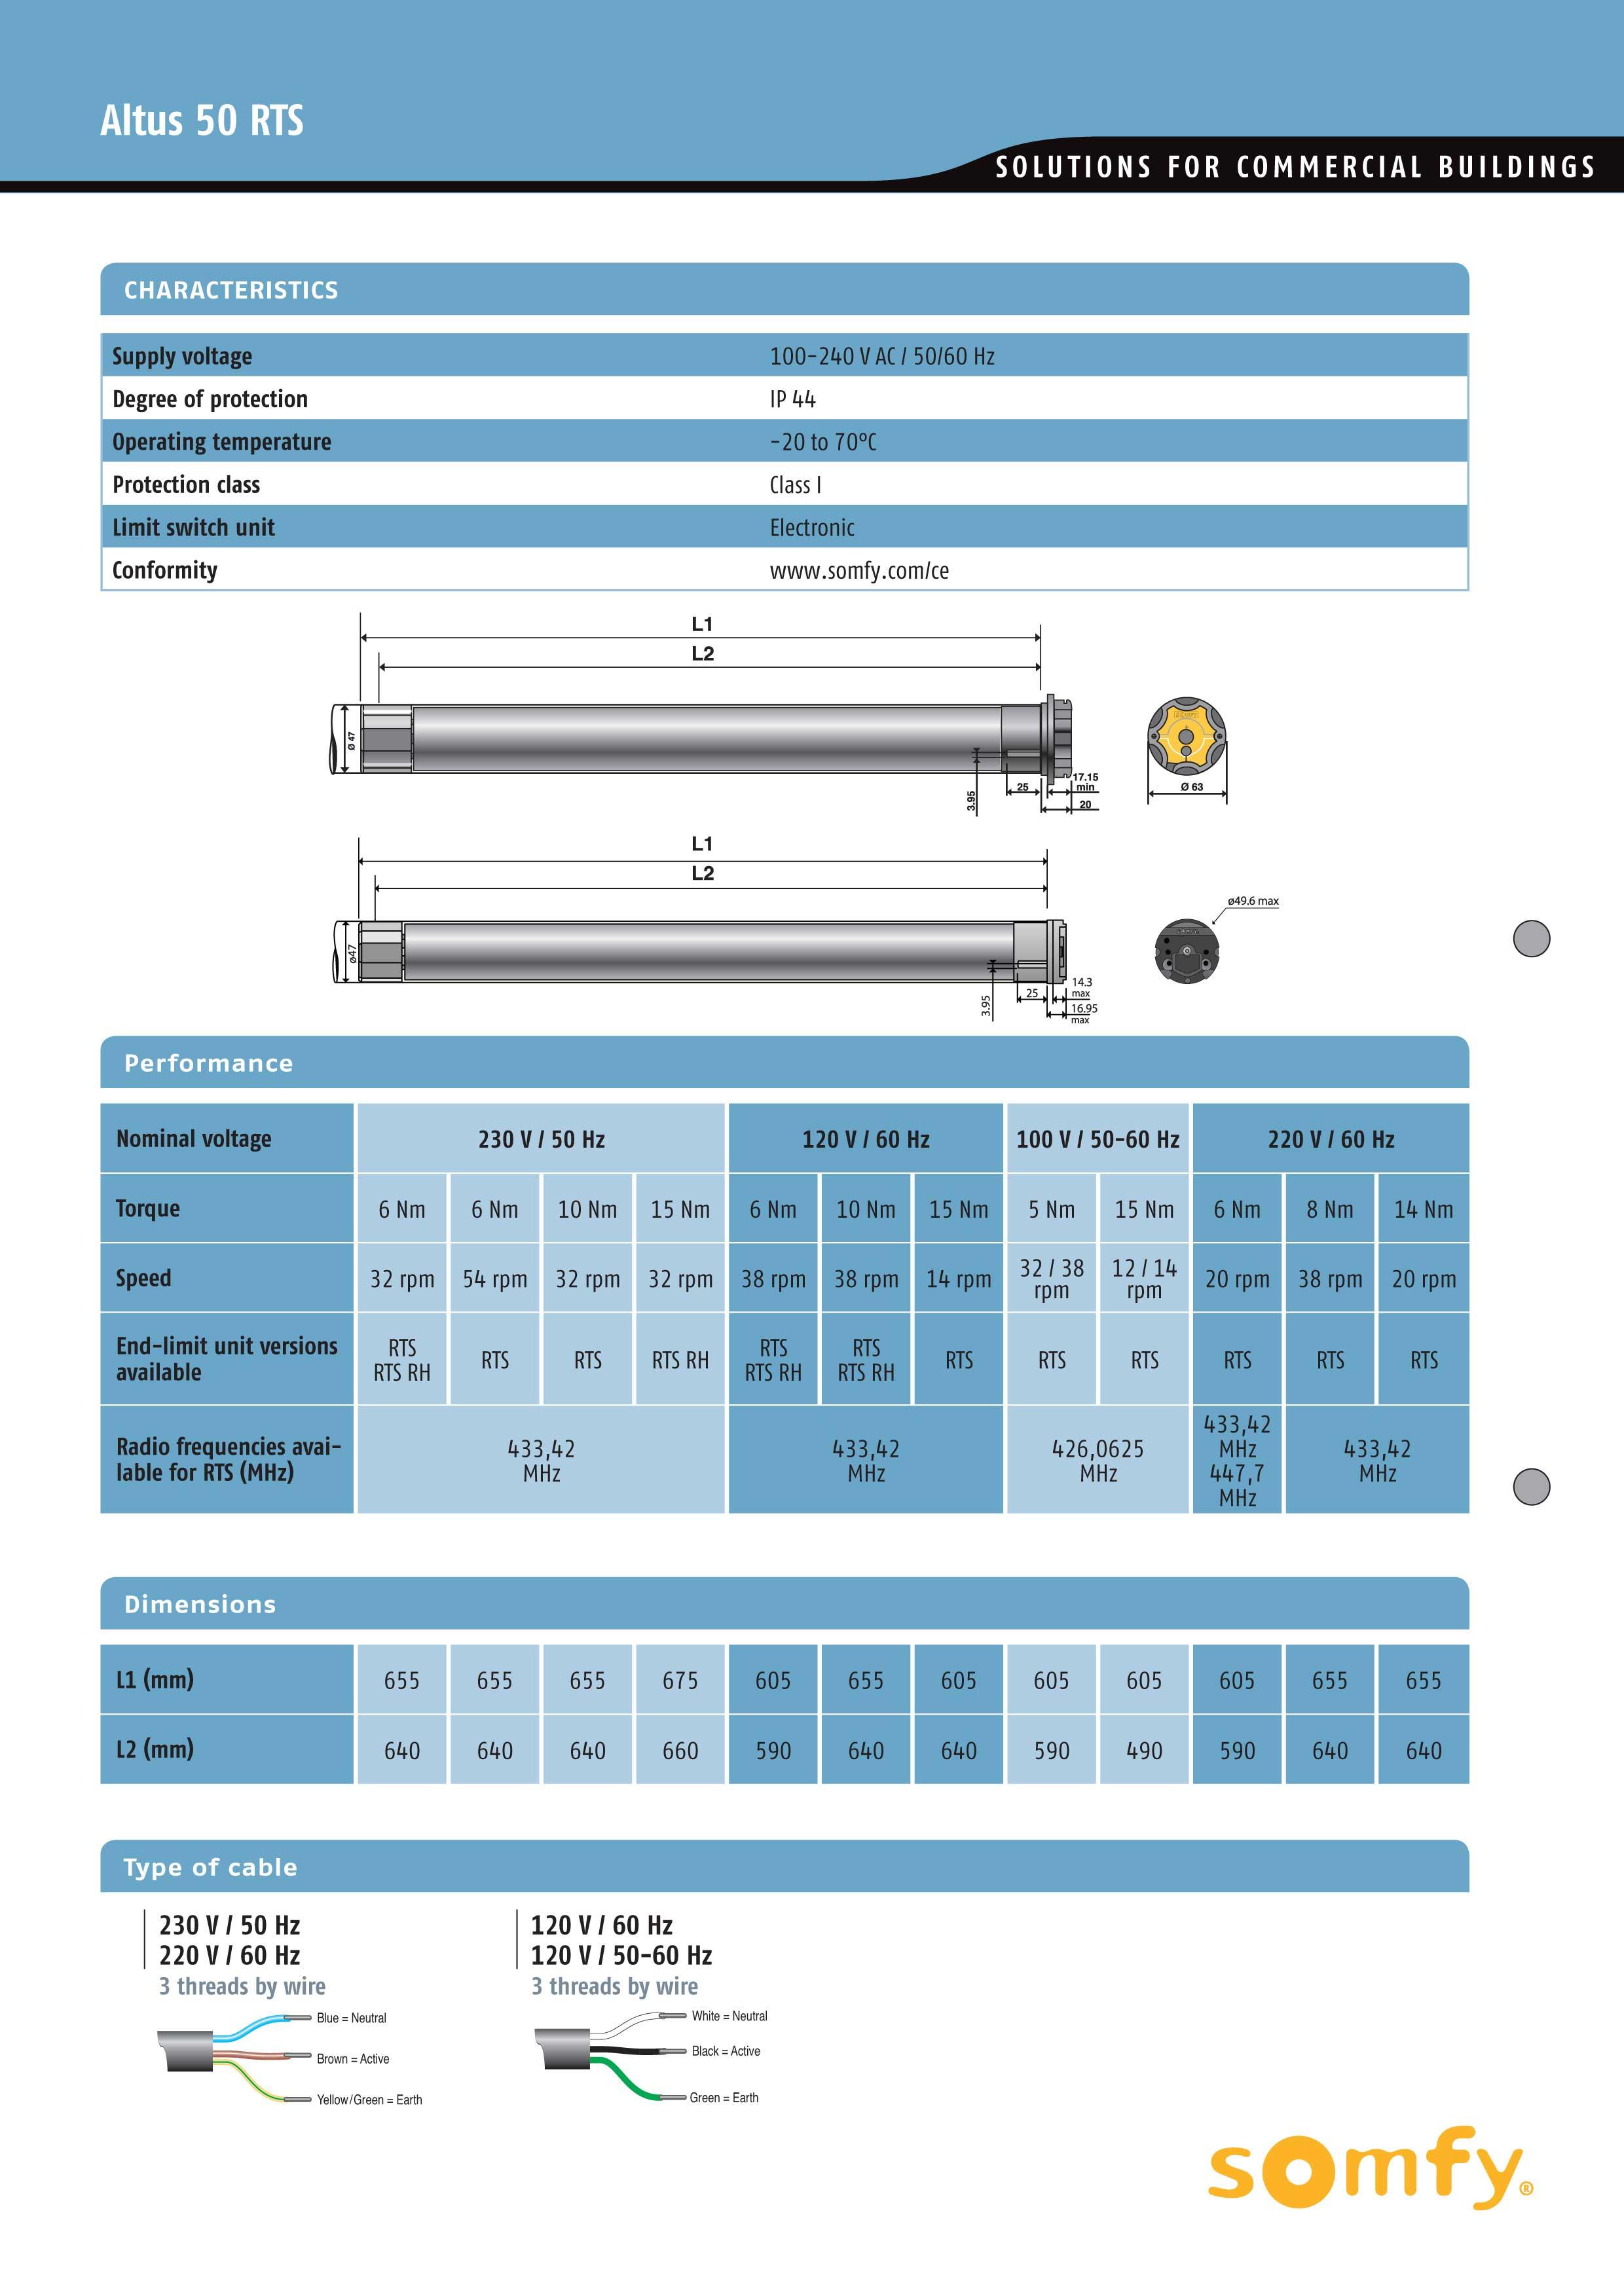 Somfy Altus Motor Wiring Diagram - Circuit Wiring And Diagram Hub •